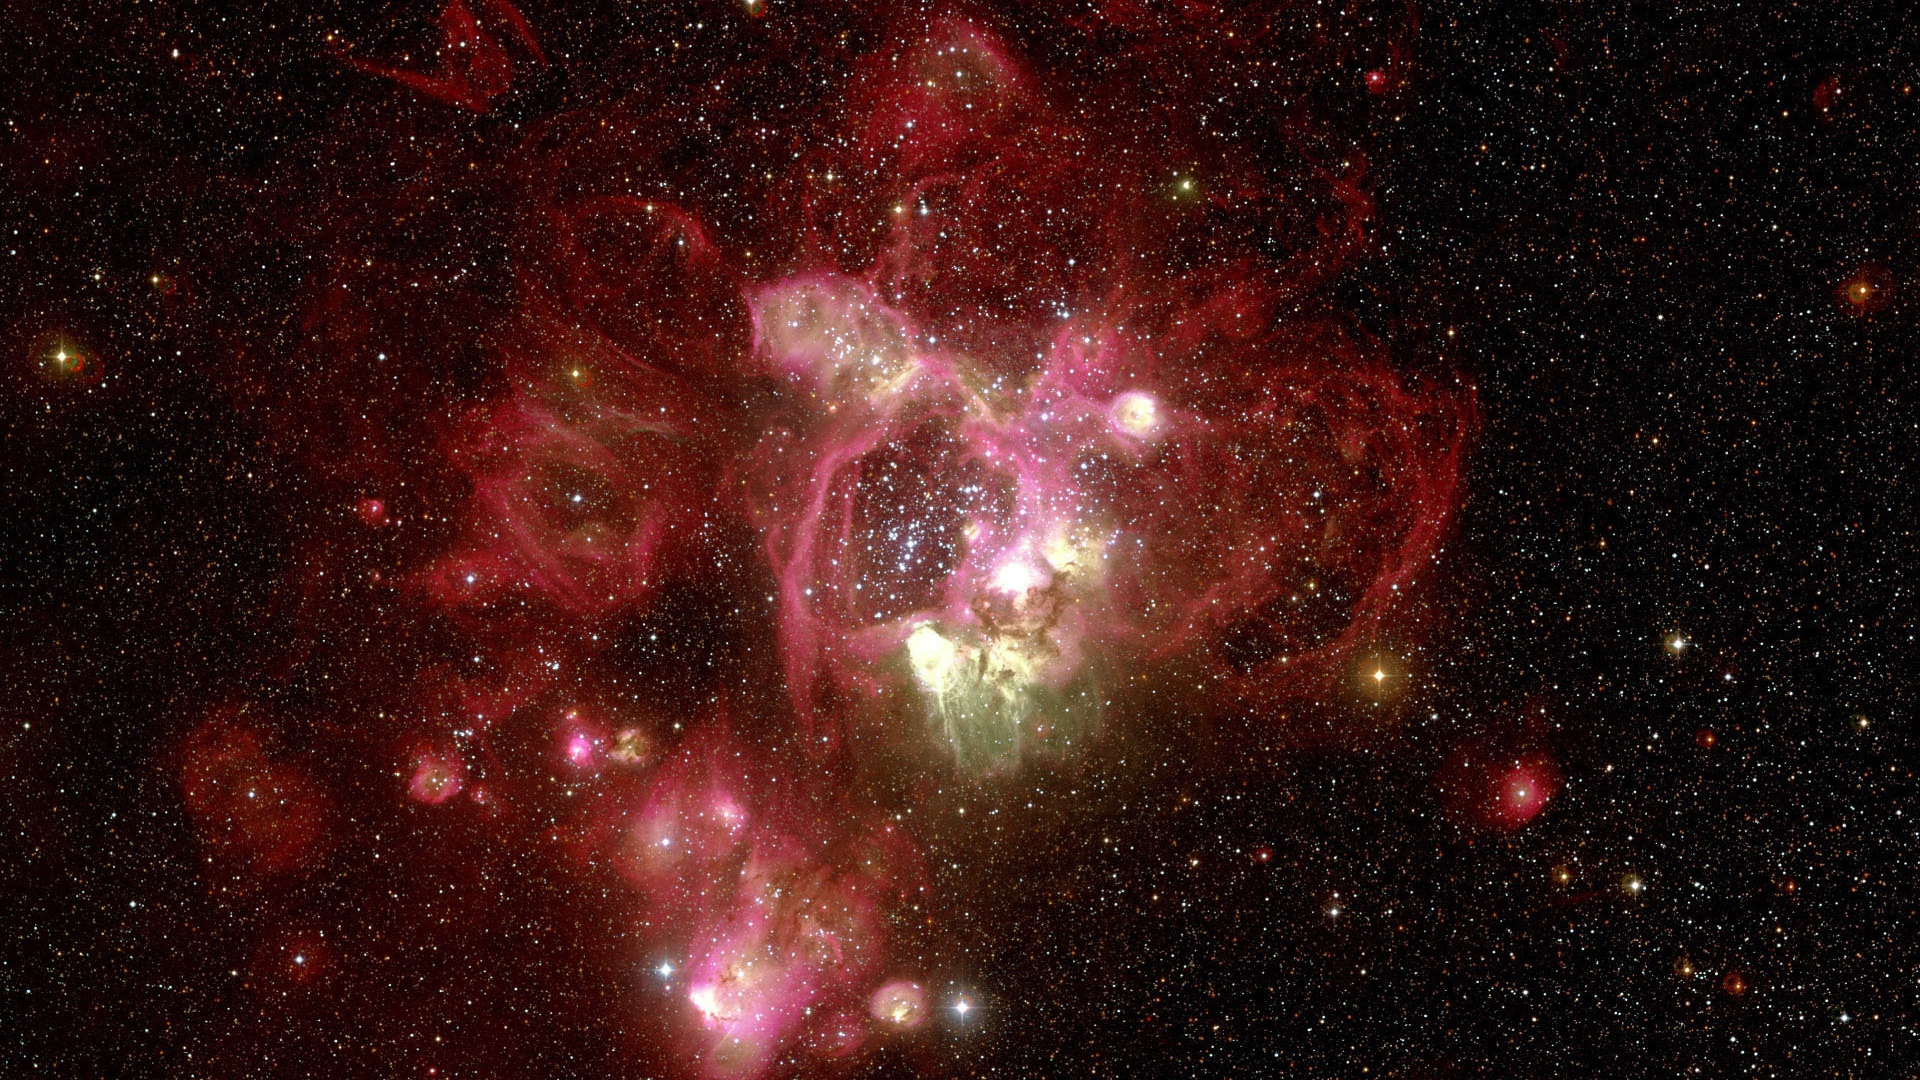 Download Wallpaper 1920x1080 Nebula Red Hubble Telescope Full HD 1920x1080